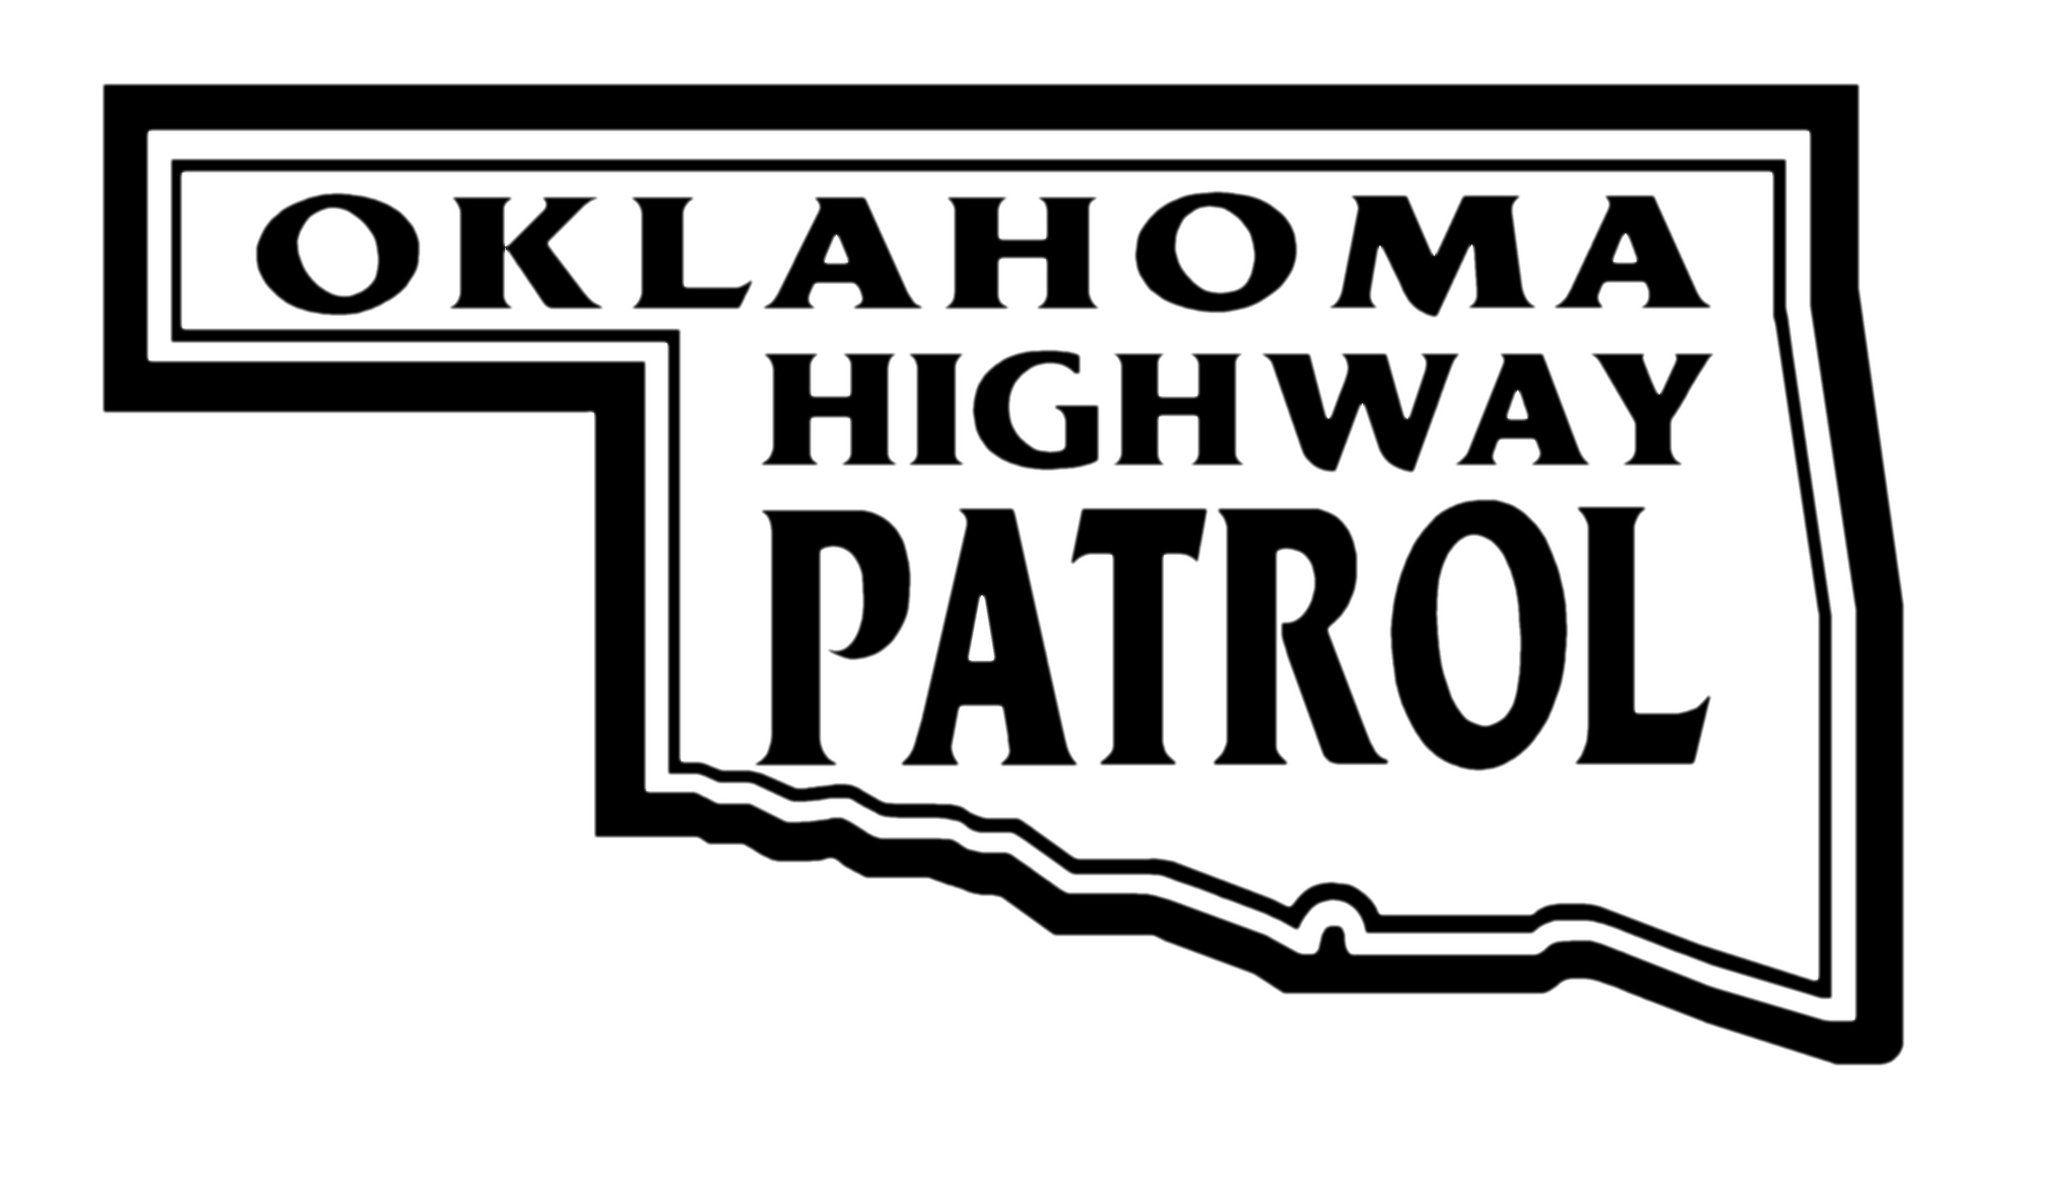 Oklahoma Highway Patrol Michael Morris Oklahoma Condolence Messages